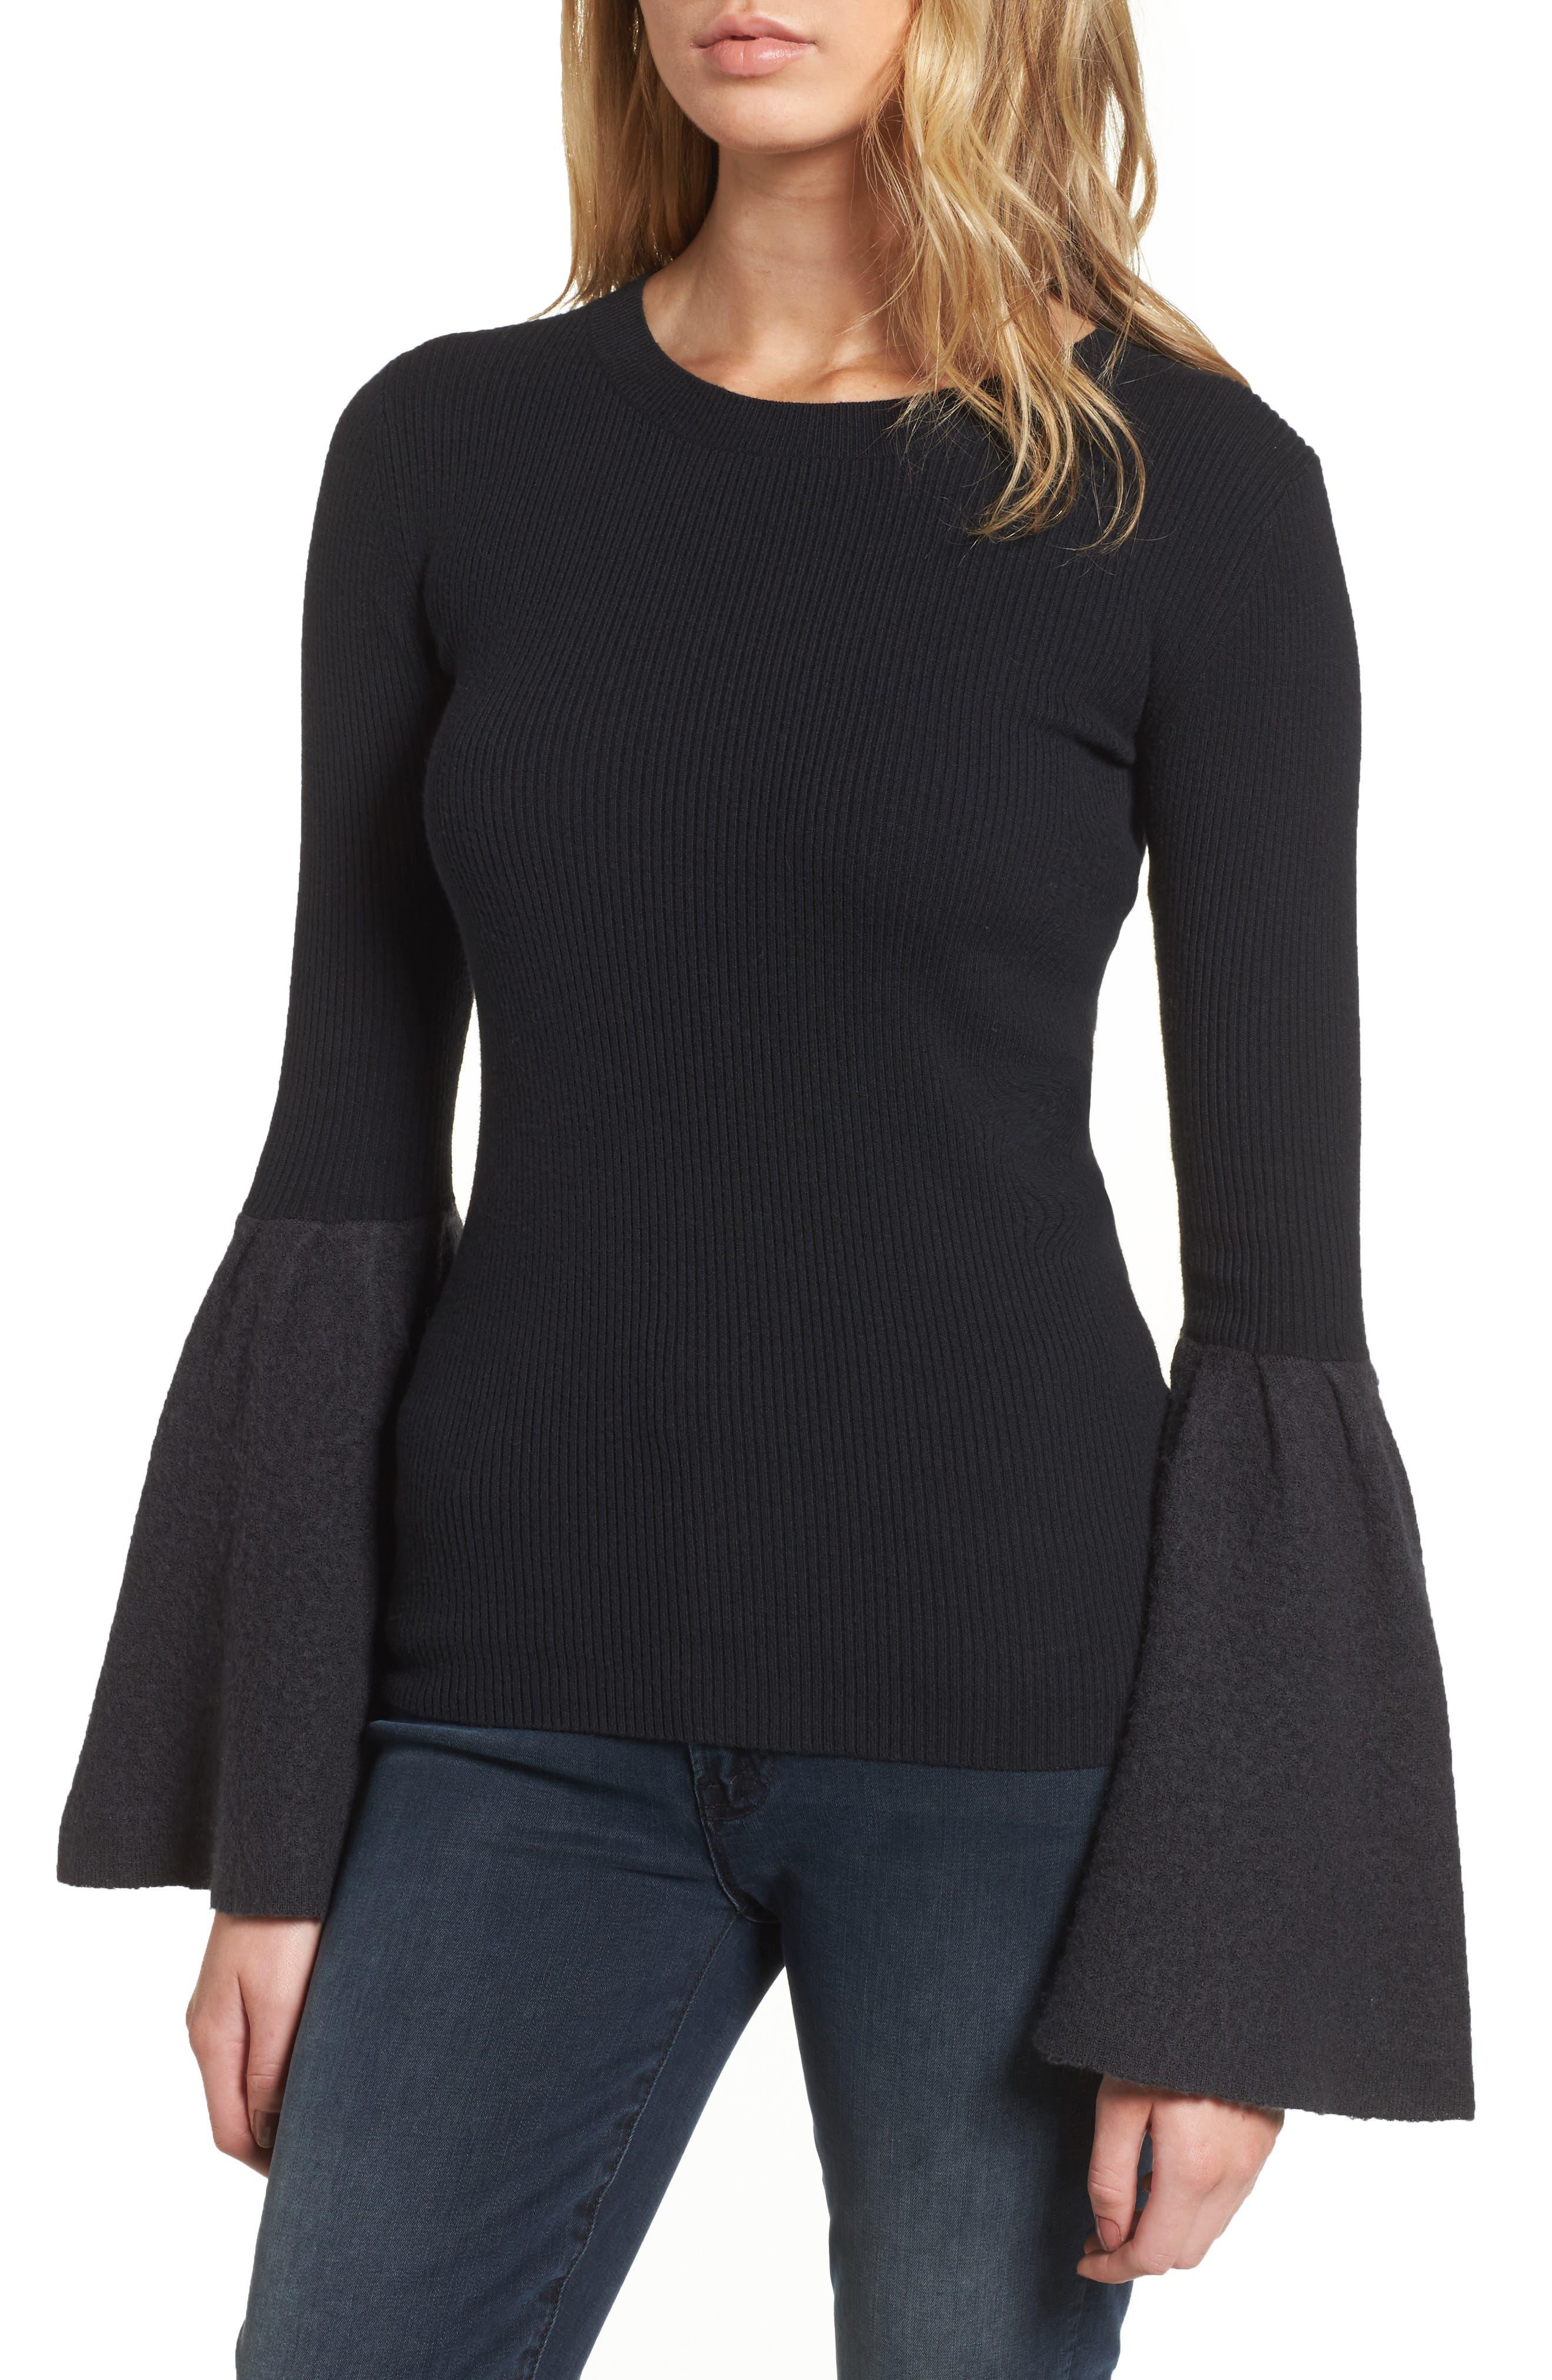 Alternate Image 1 Selected - Chelsea28 Bell Sleeve Sweater